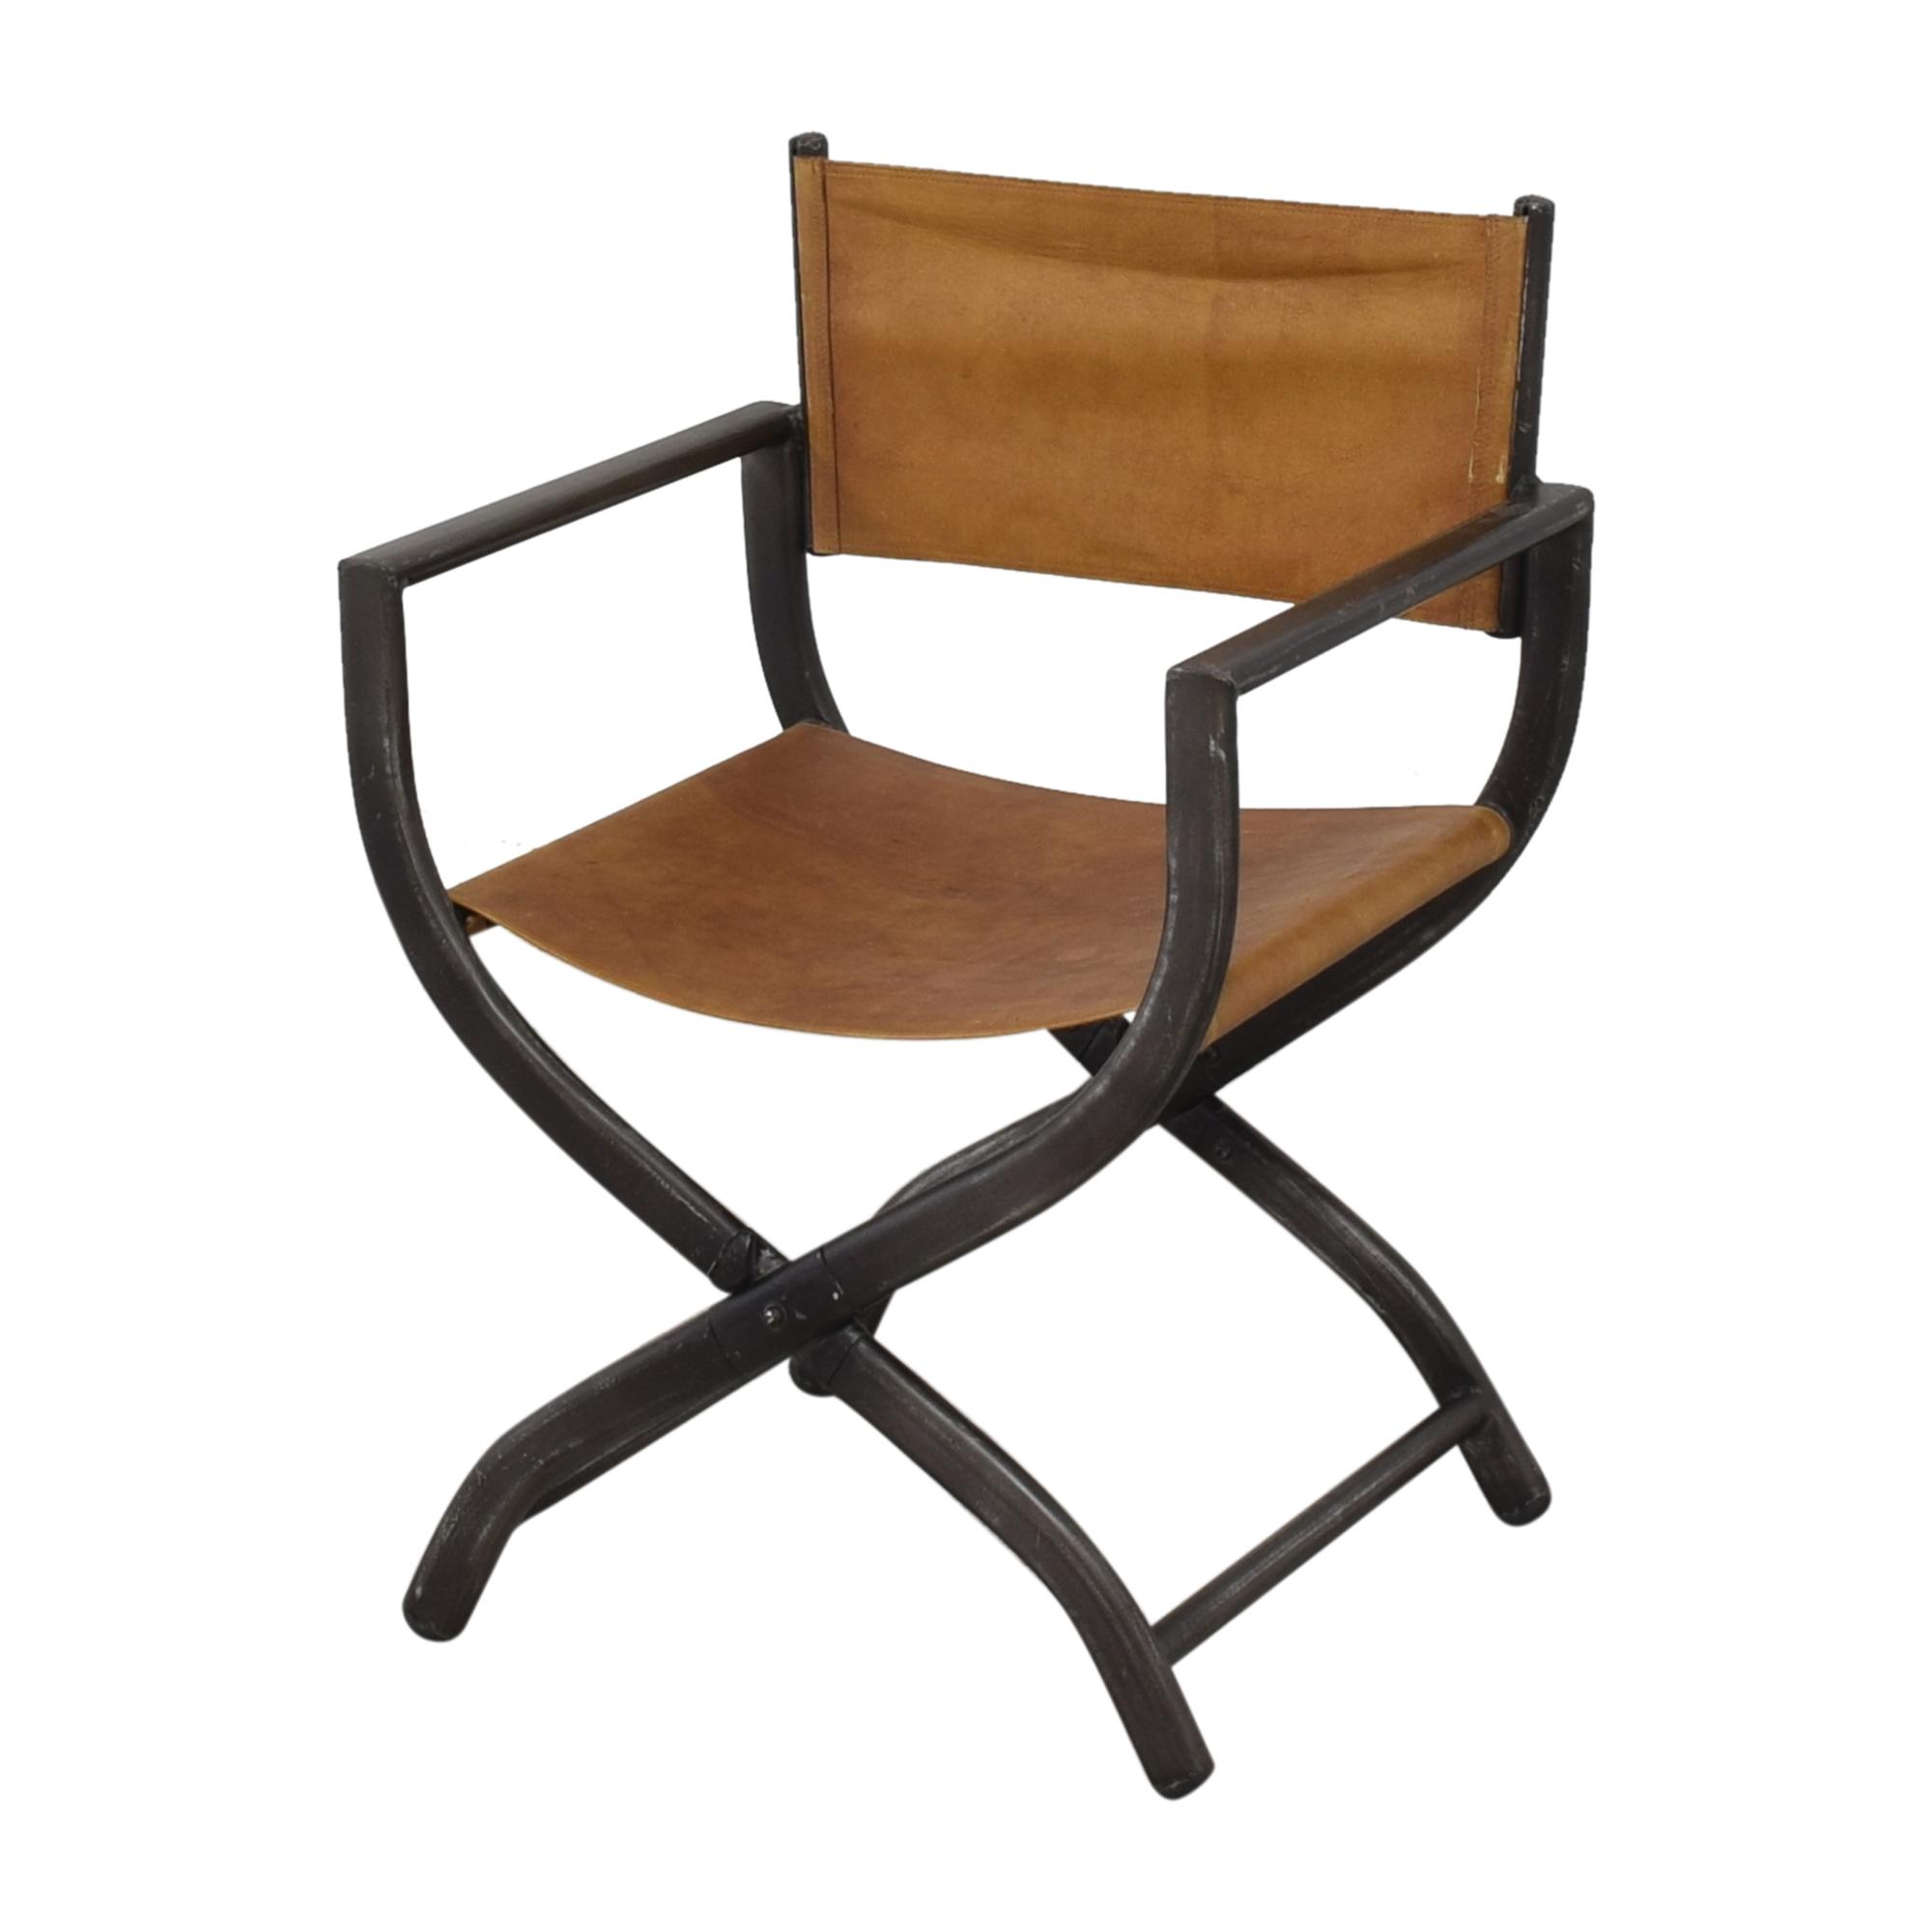 buy Restoration Hardware 1970s French Director's Chair Restoration Hardware